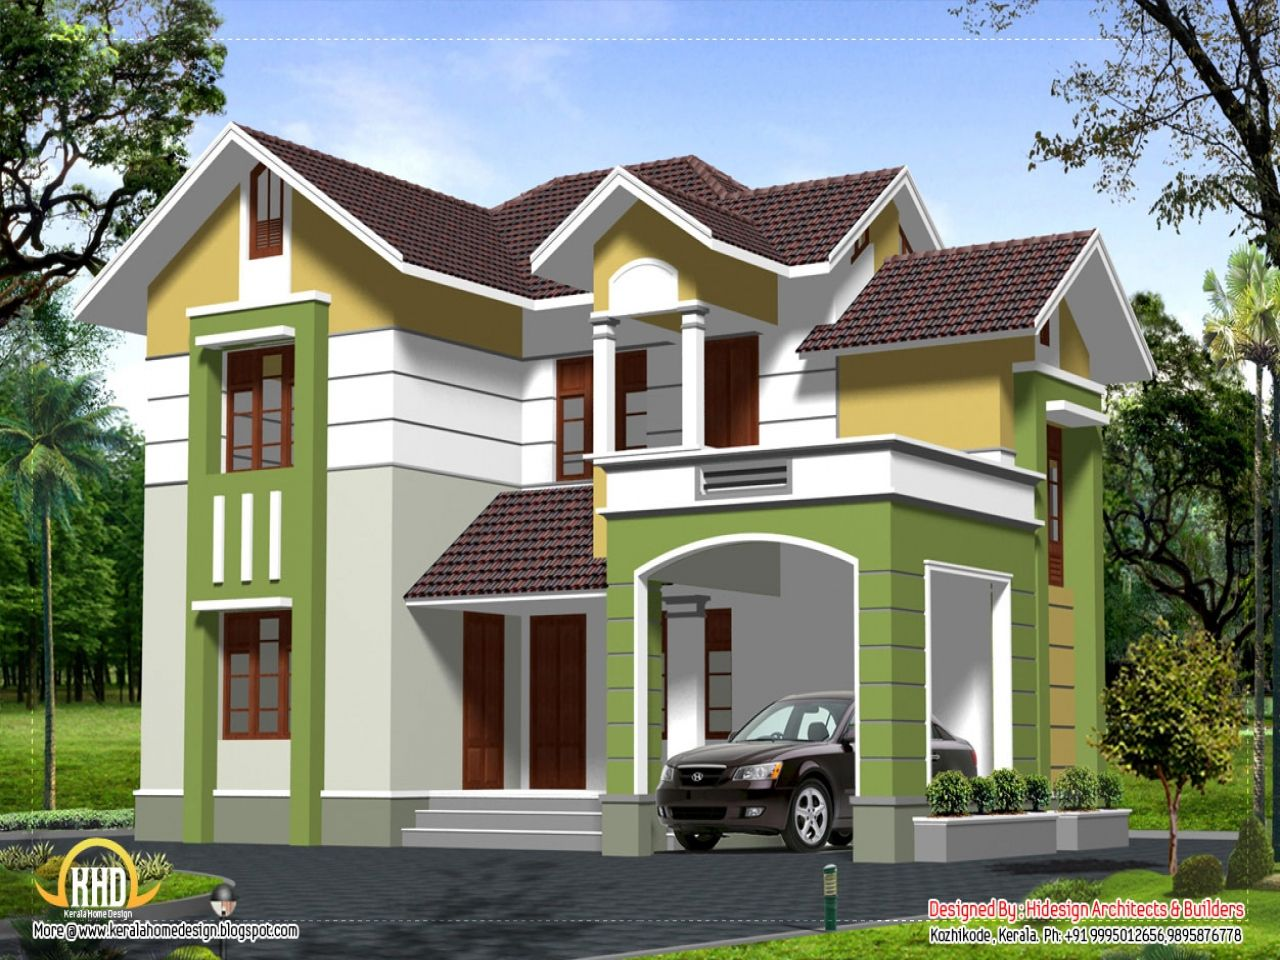 Small modern house design ideas exterior storey also rh pinterest